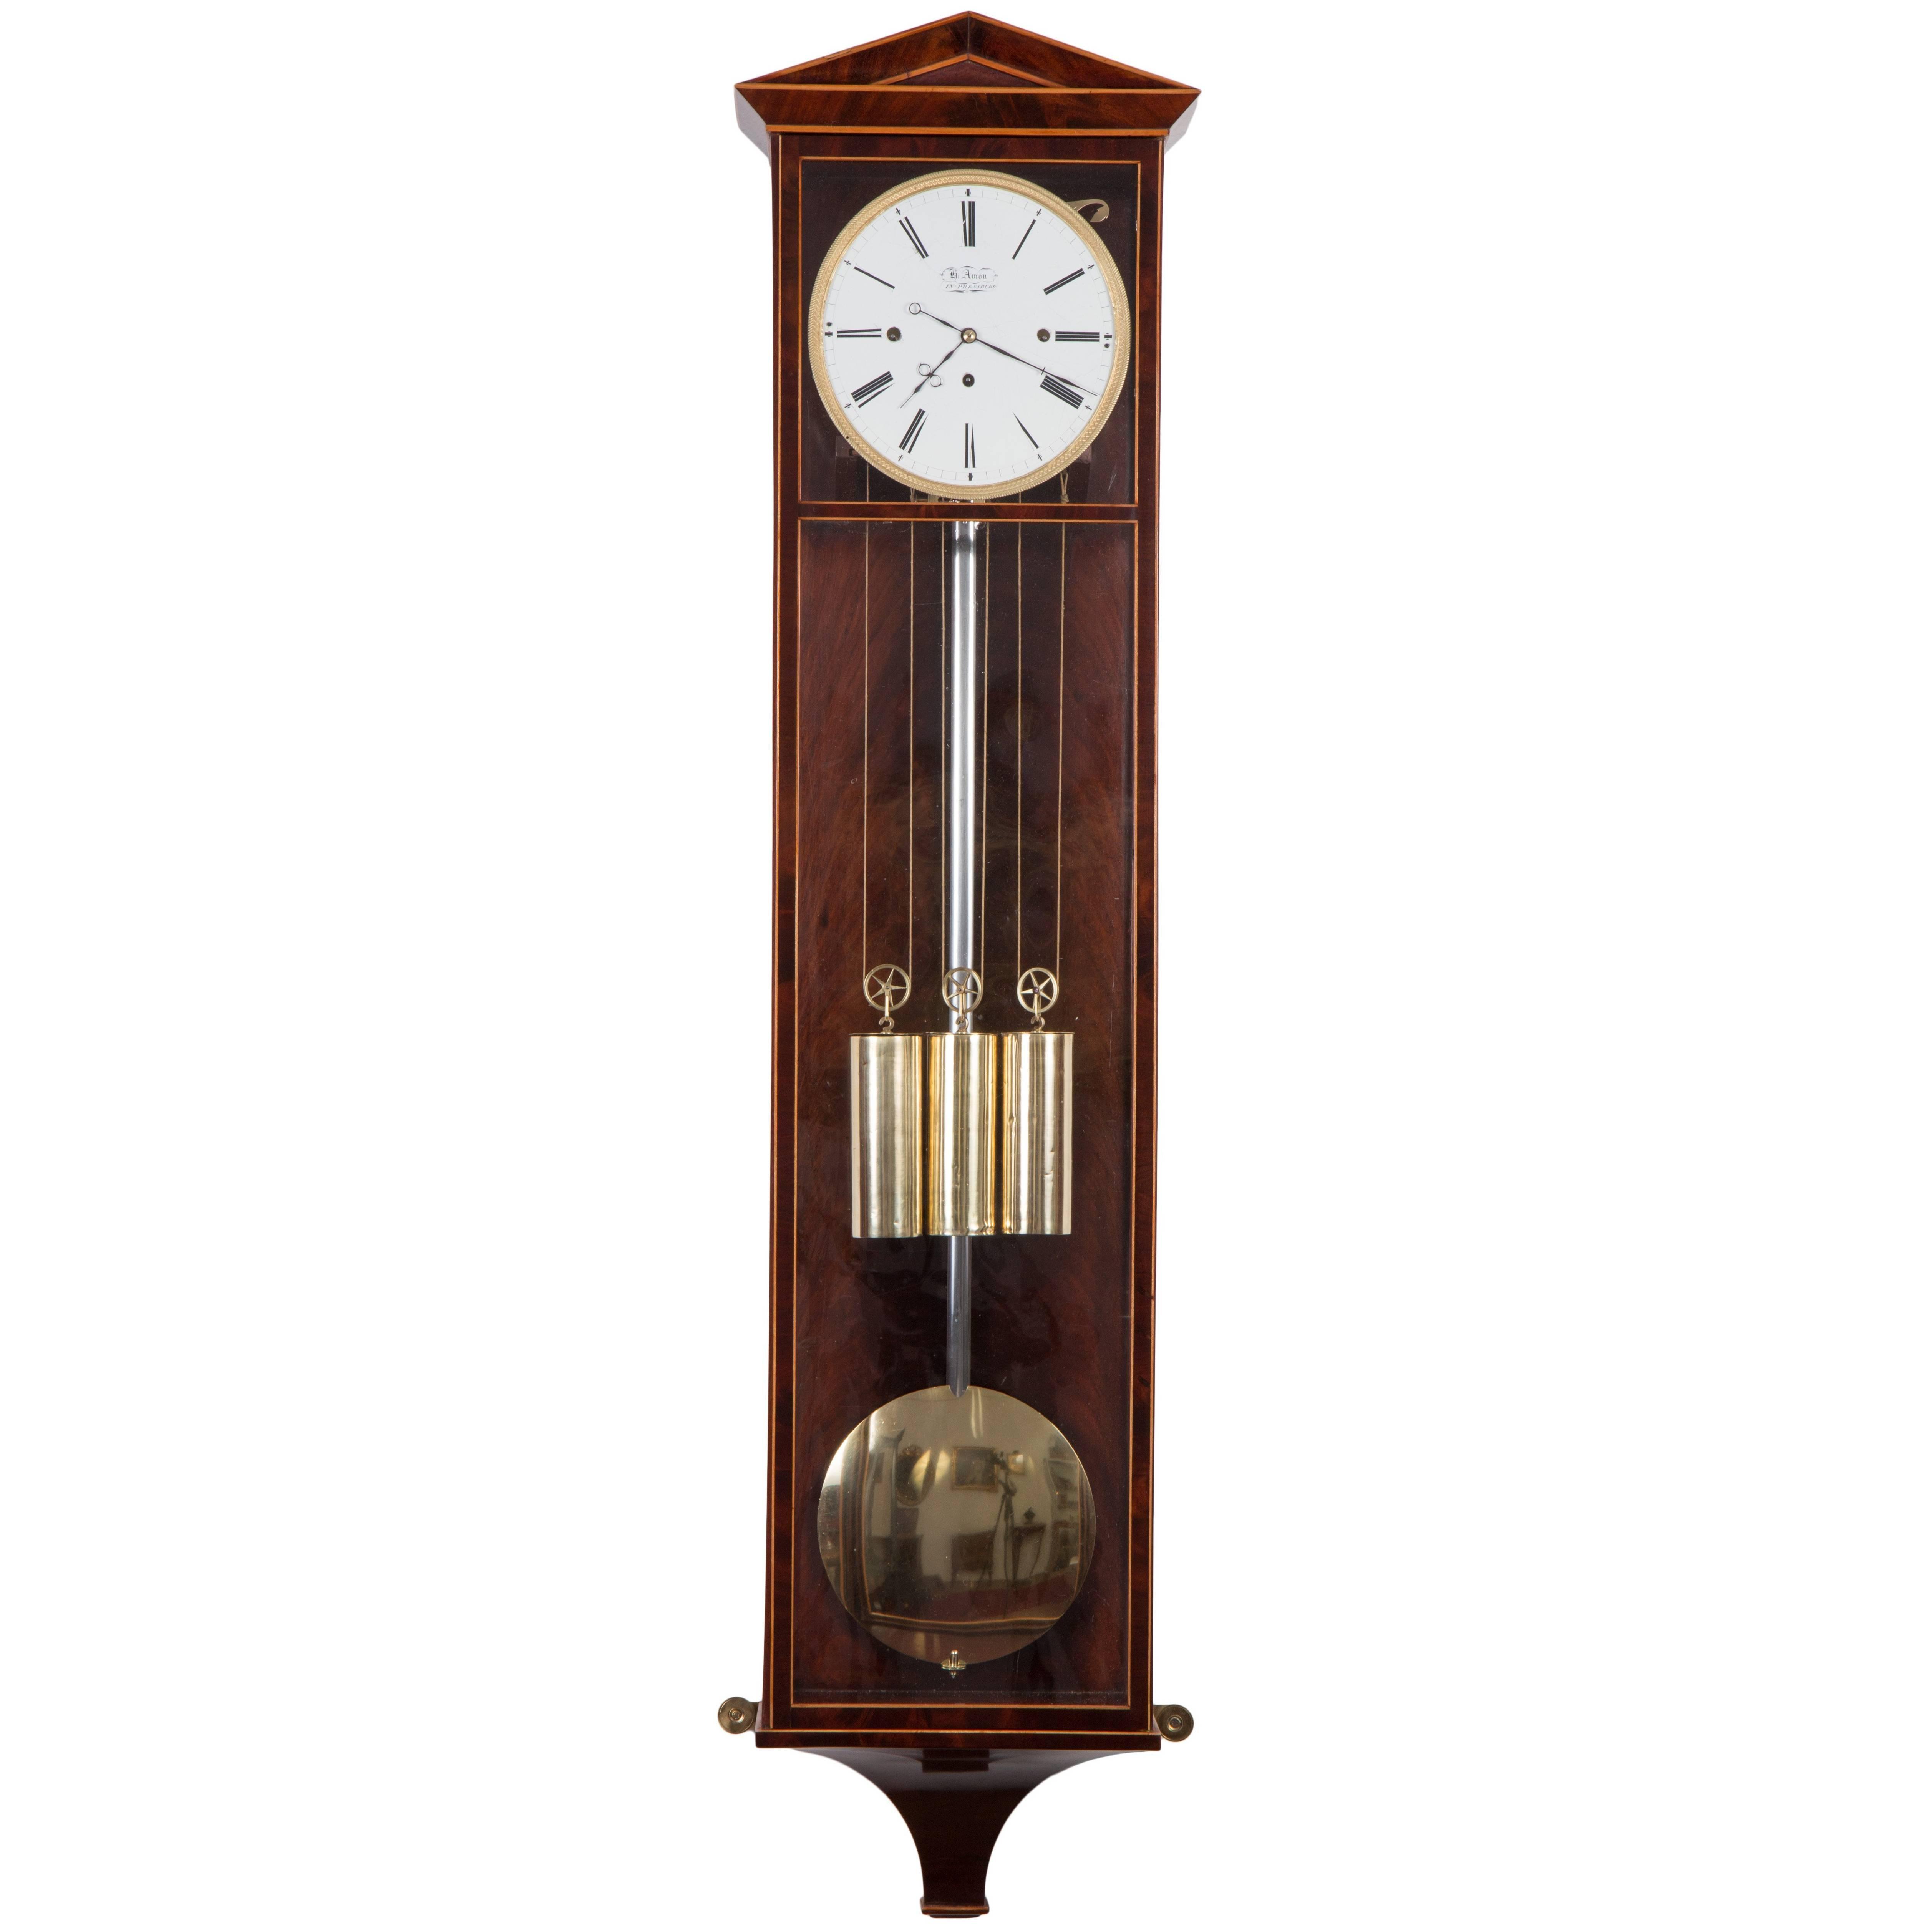 dachl clock by h amon in pressburg bratislava circa